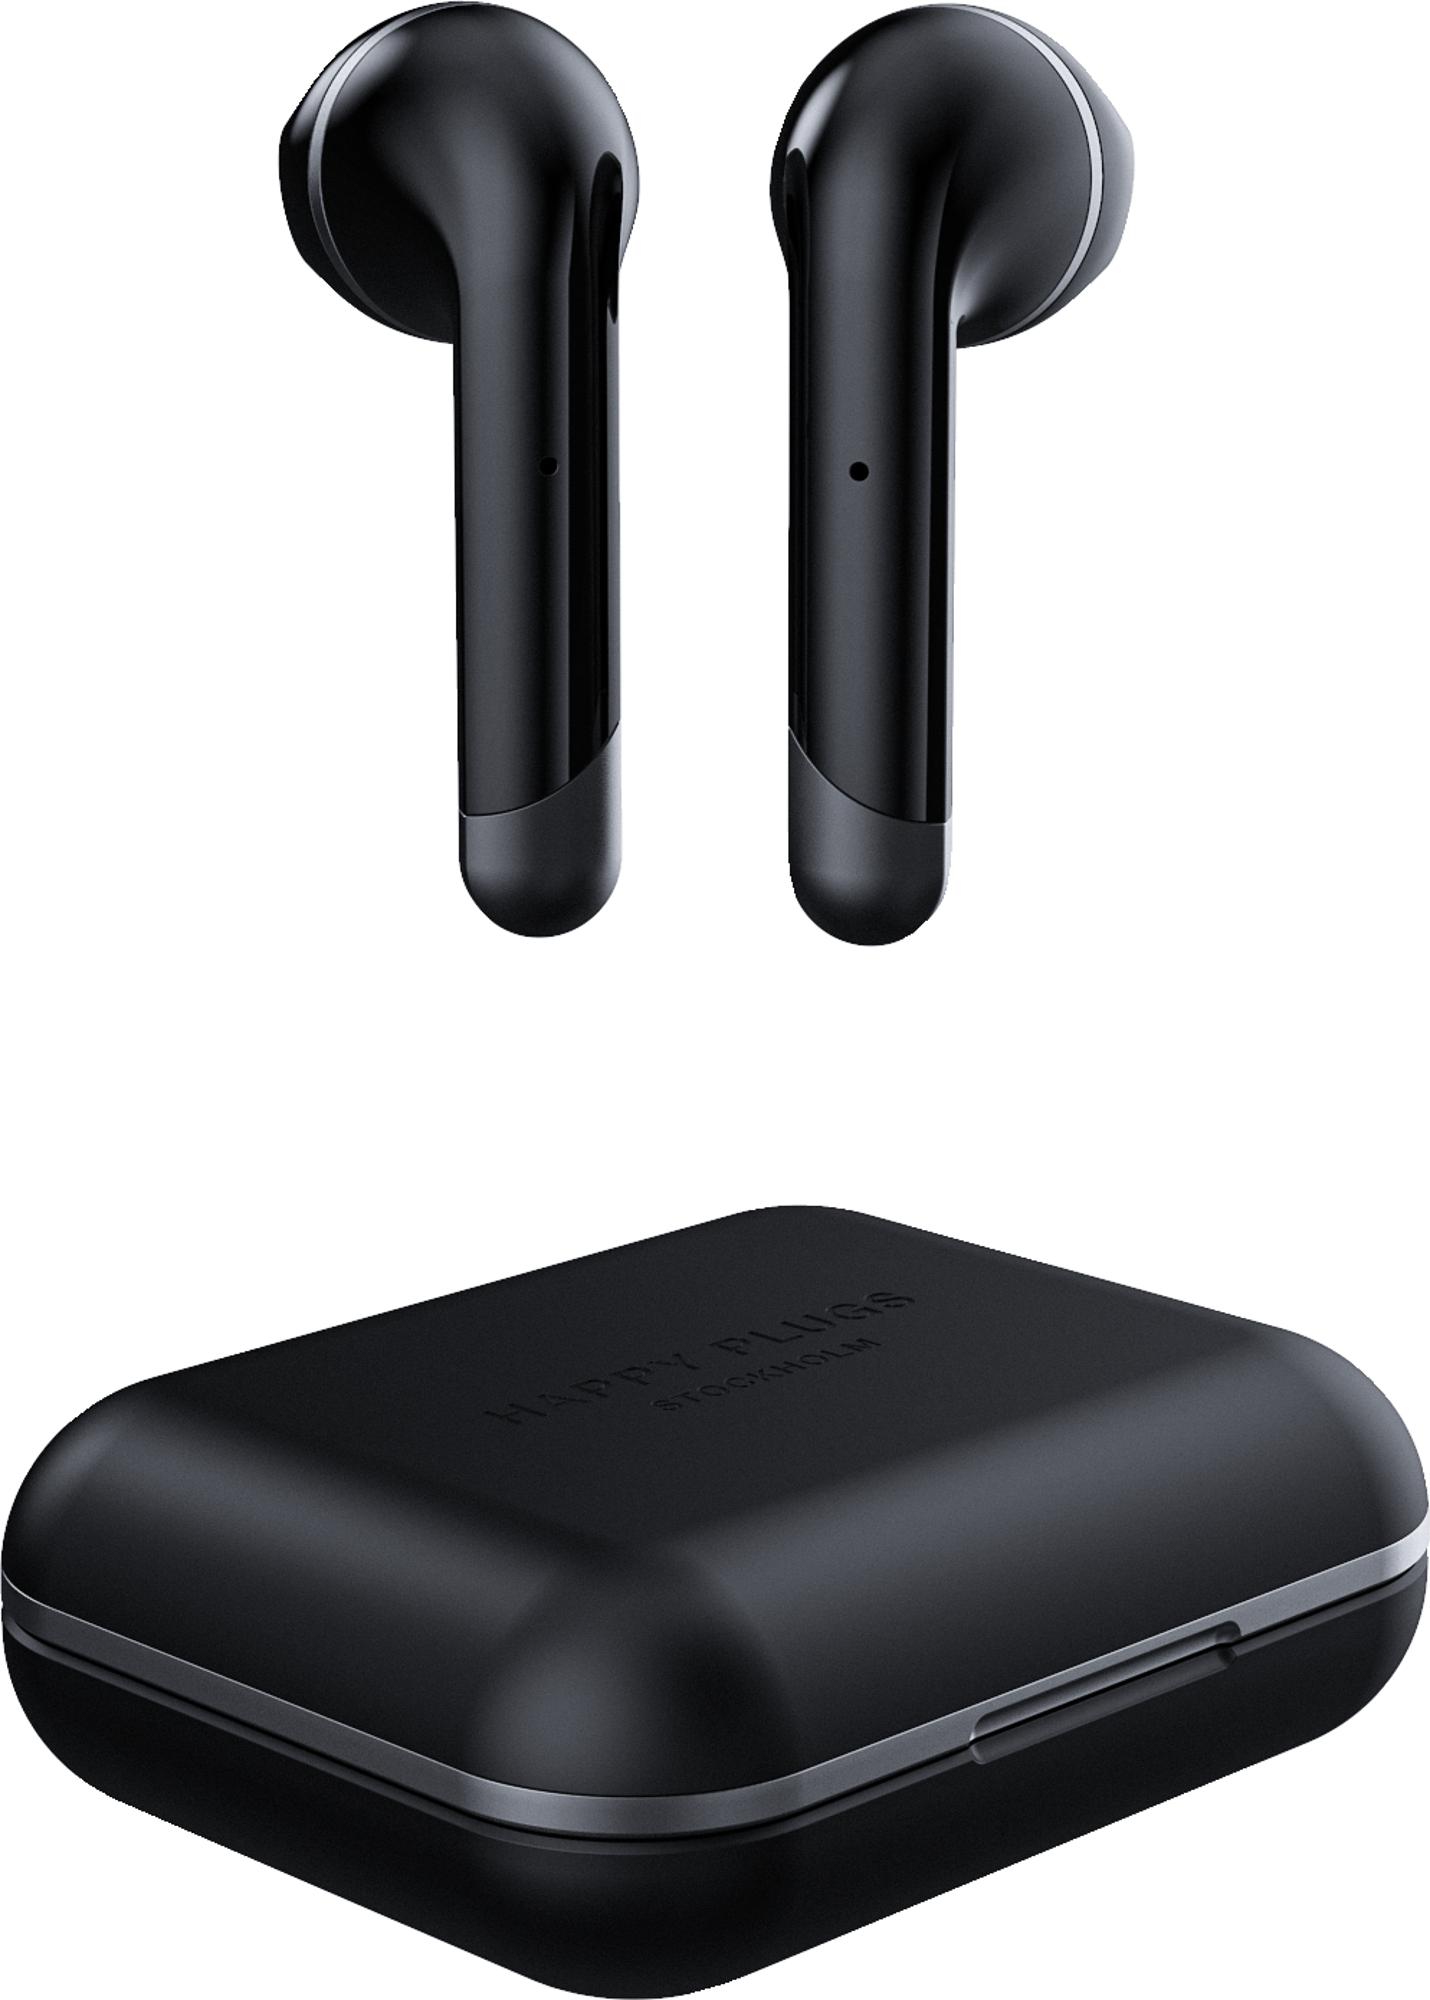 image of: Happy Plugs Air 1 Original True Wireless Earbuds